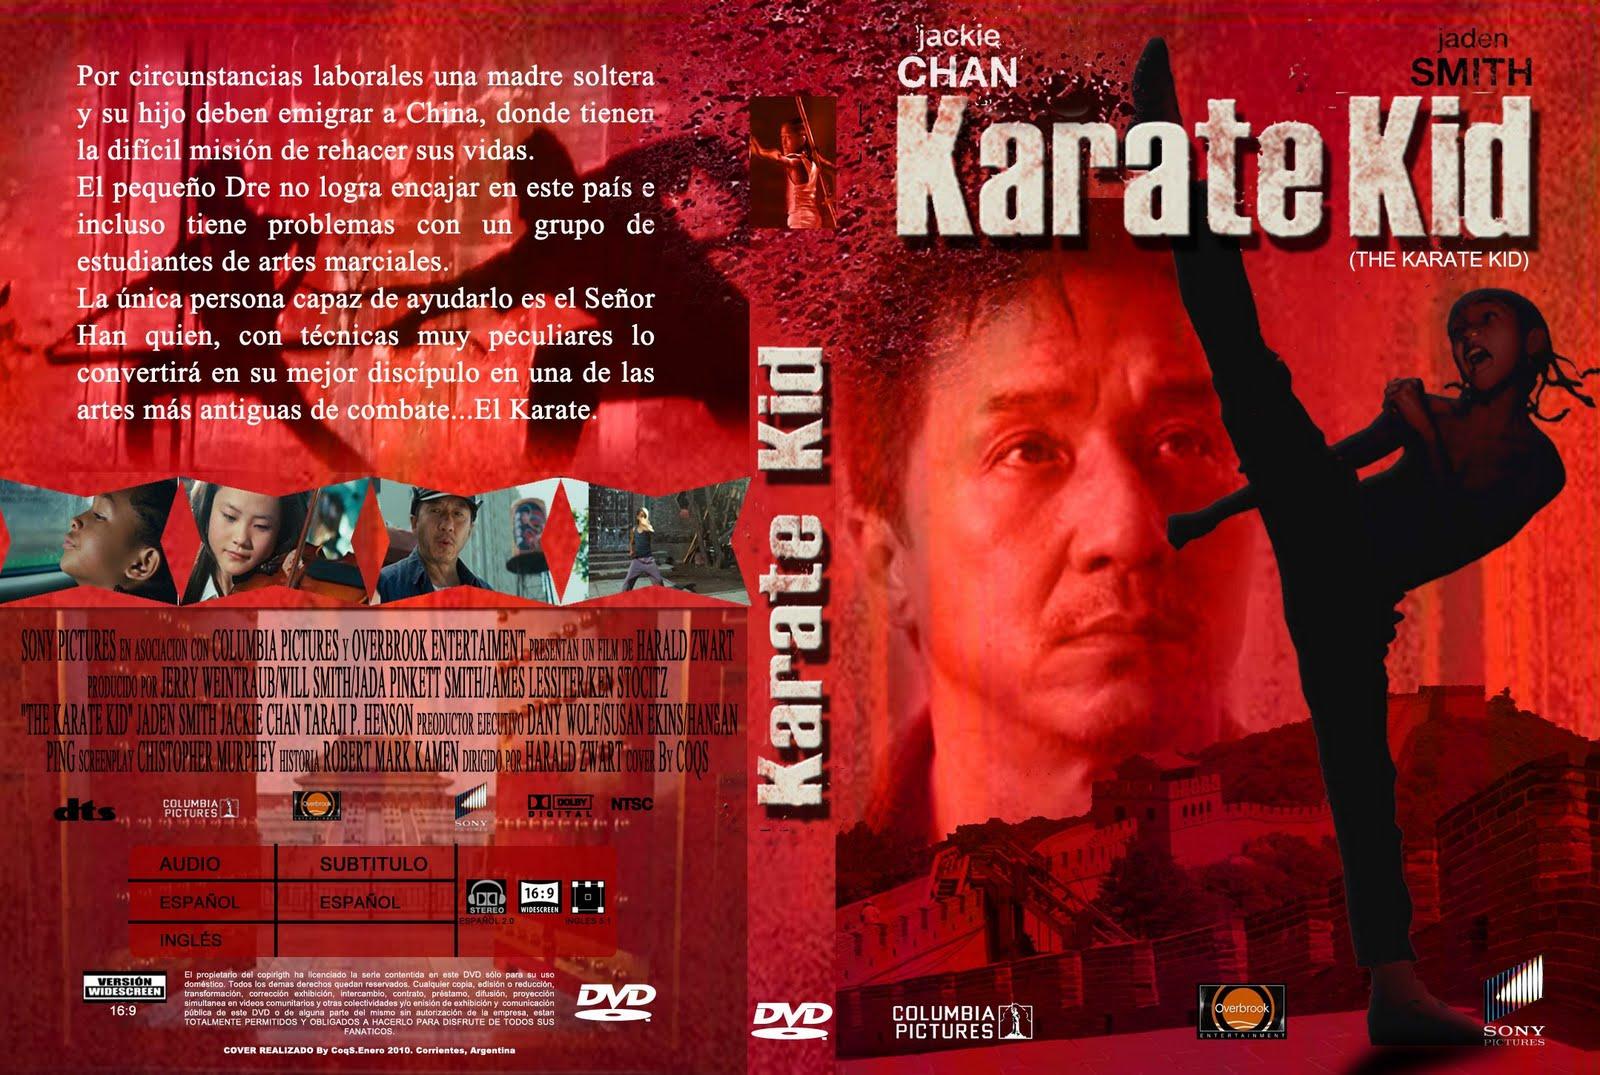 The Karate Kid 2010 HD [ Titra Shqip ]